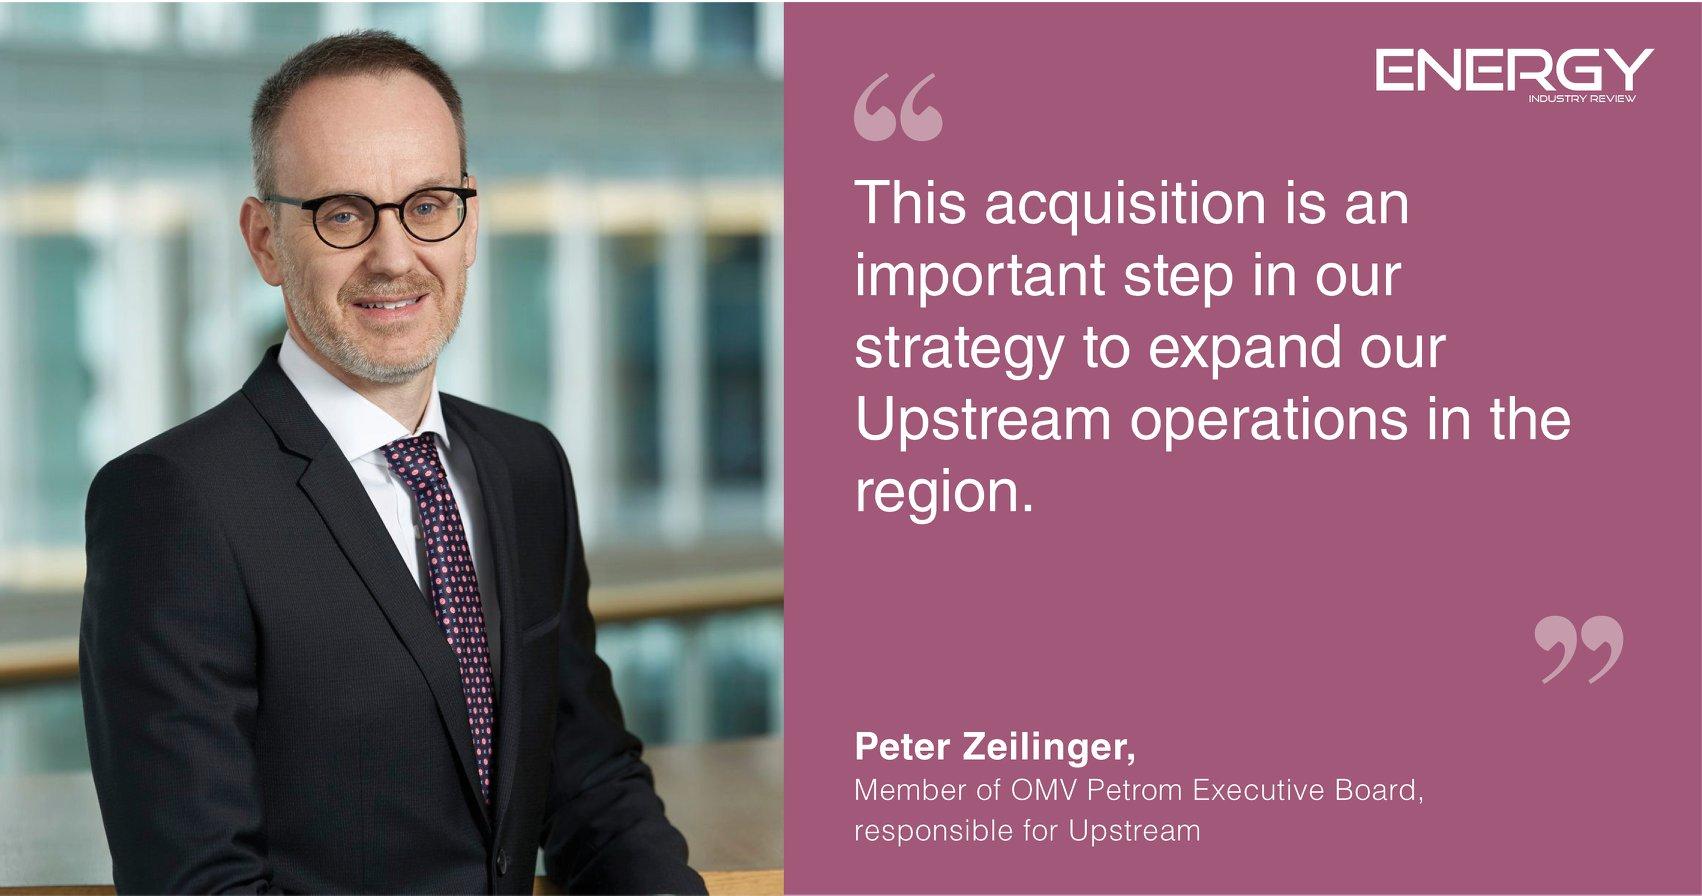 Peter Zeilinger, member of OMV Petrom Executive Board, responsible for Upstream